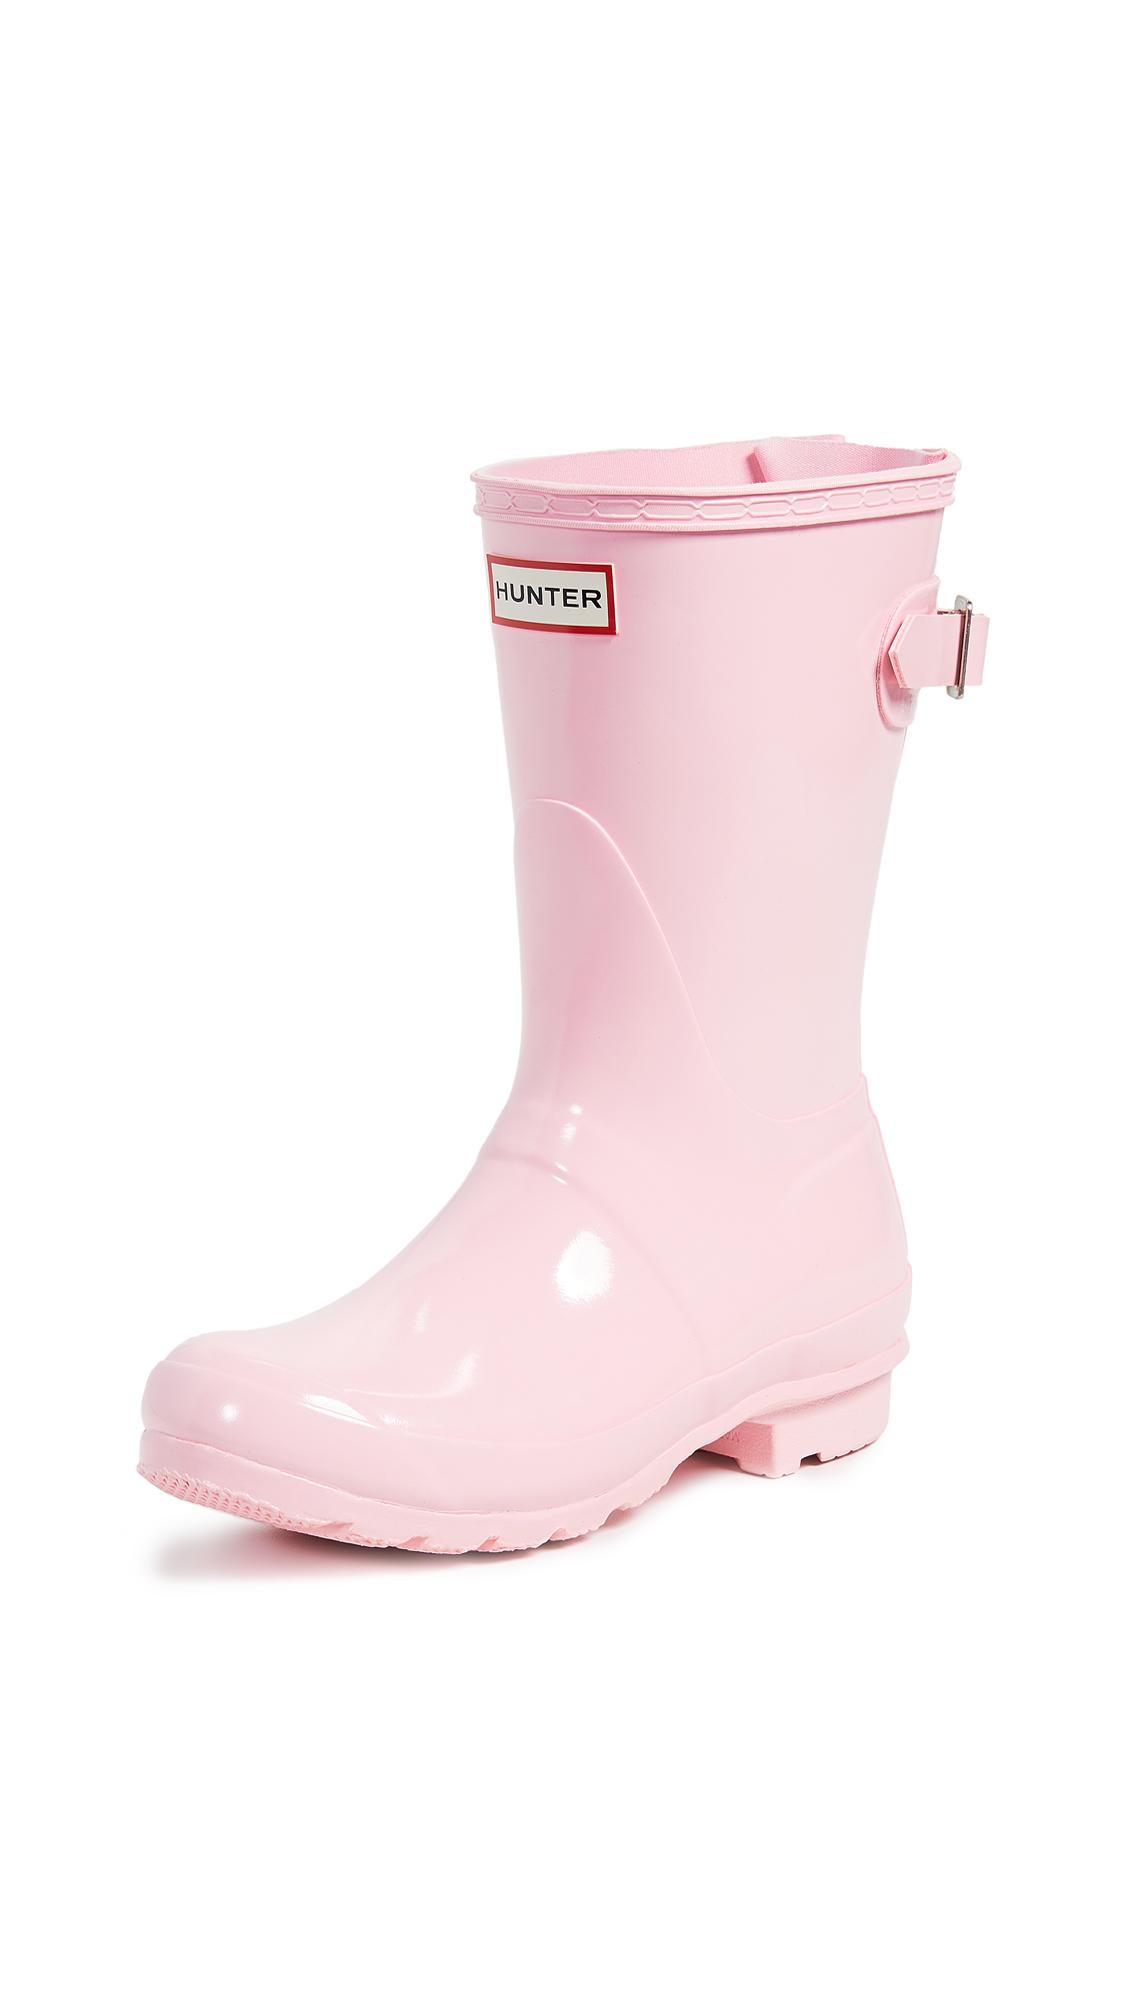 Hunter Boots Original Short Back Adjustable Boots - Candy Floss